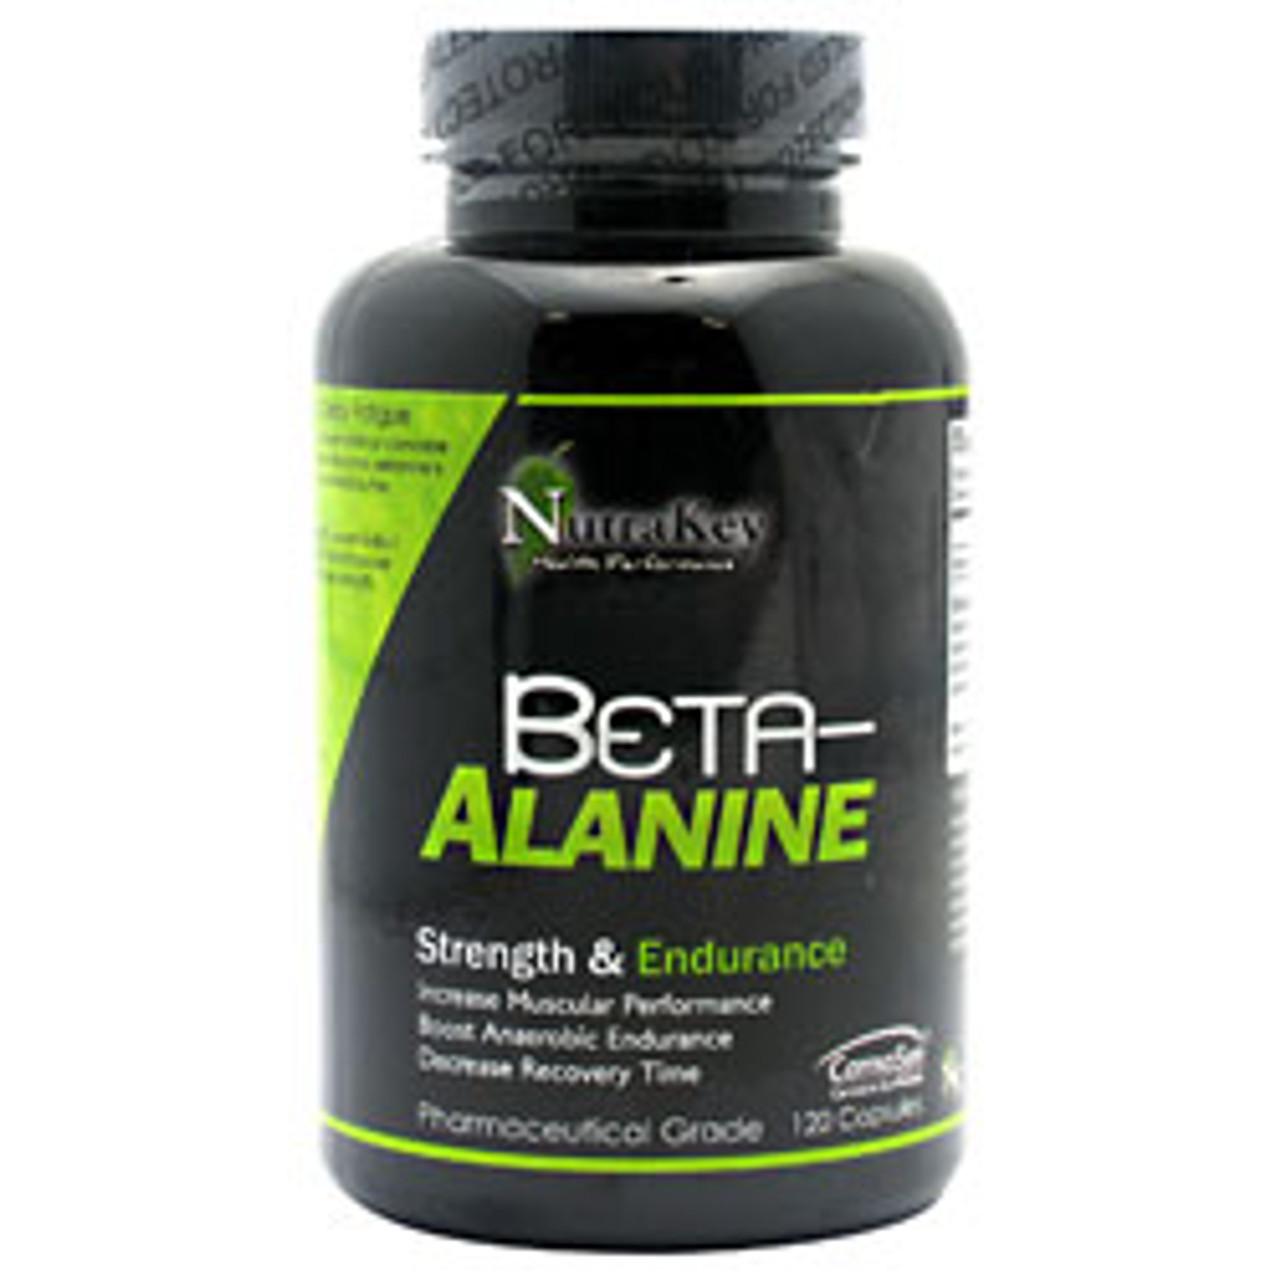 Beta Alanine 120ct Nutrakey